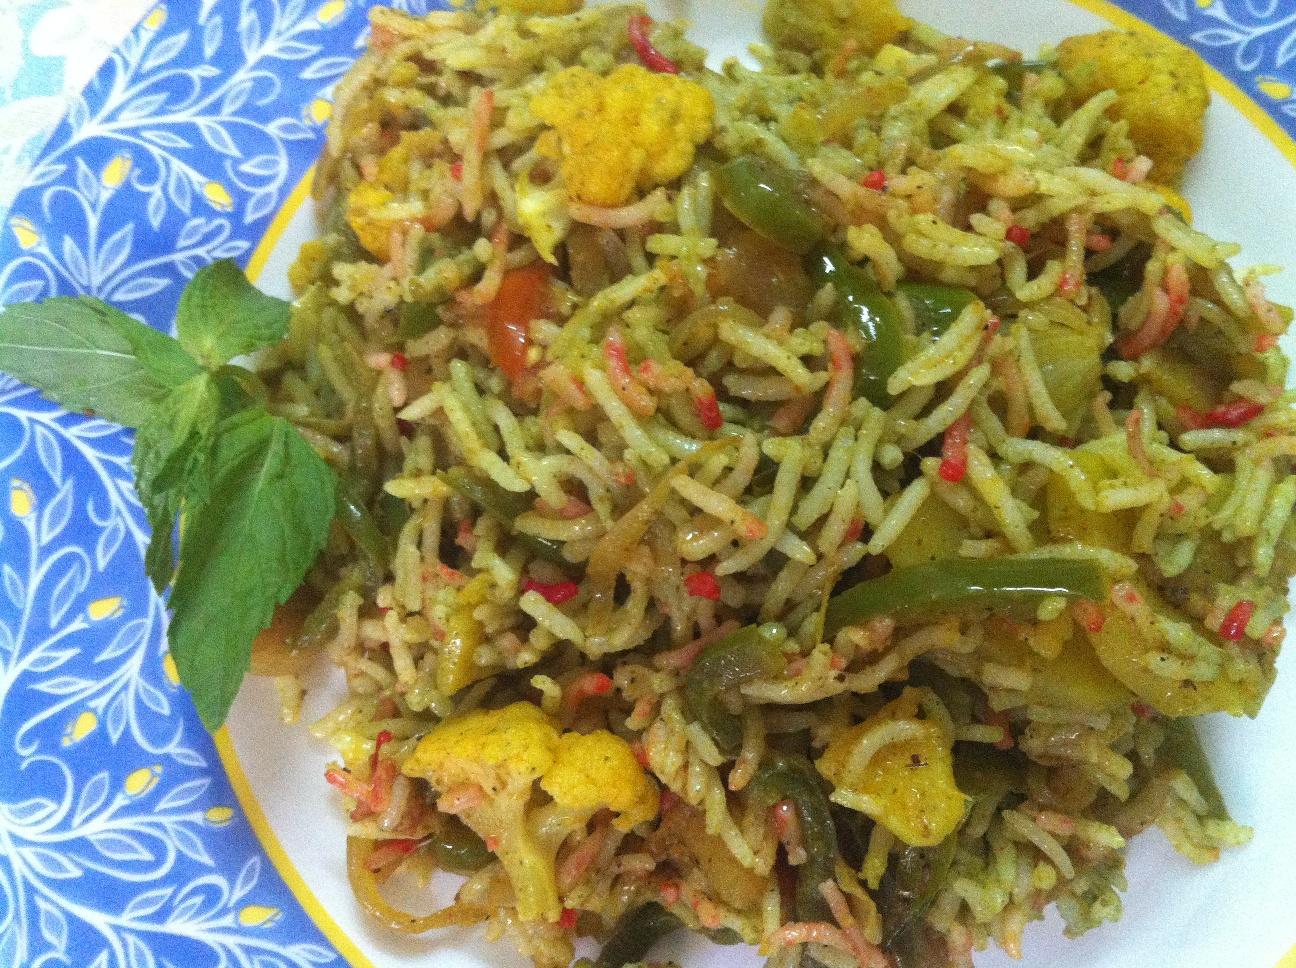 Veg hyderabadi biryani indian non indian recipe collection veg hyderabadi biryani forumfinder Image collections